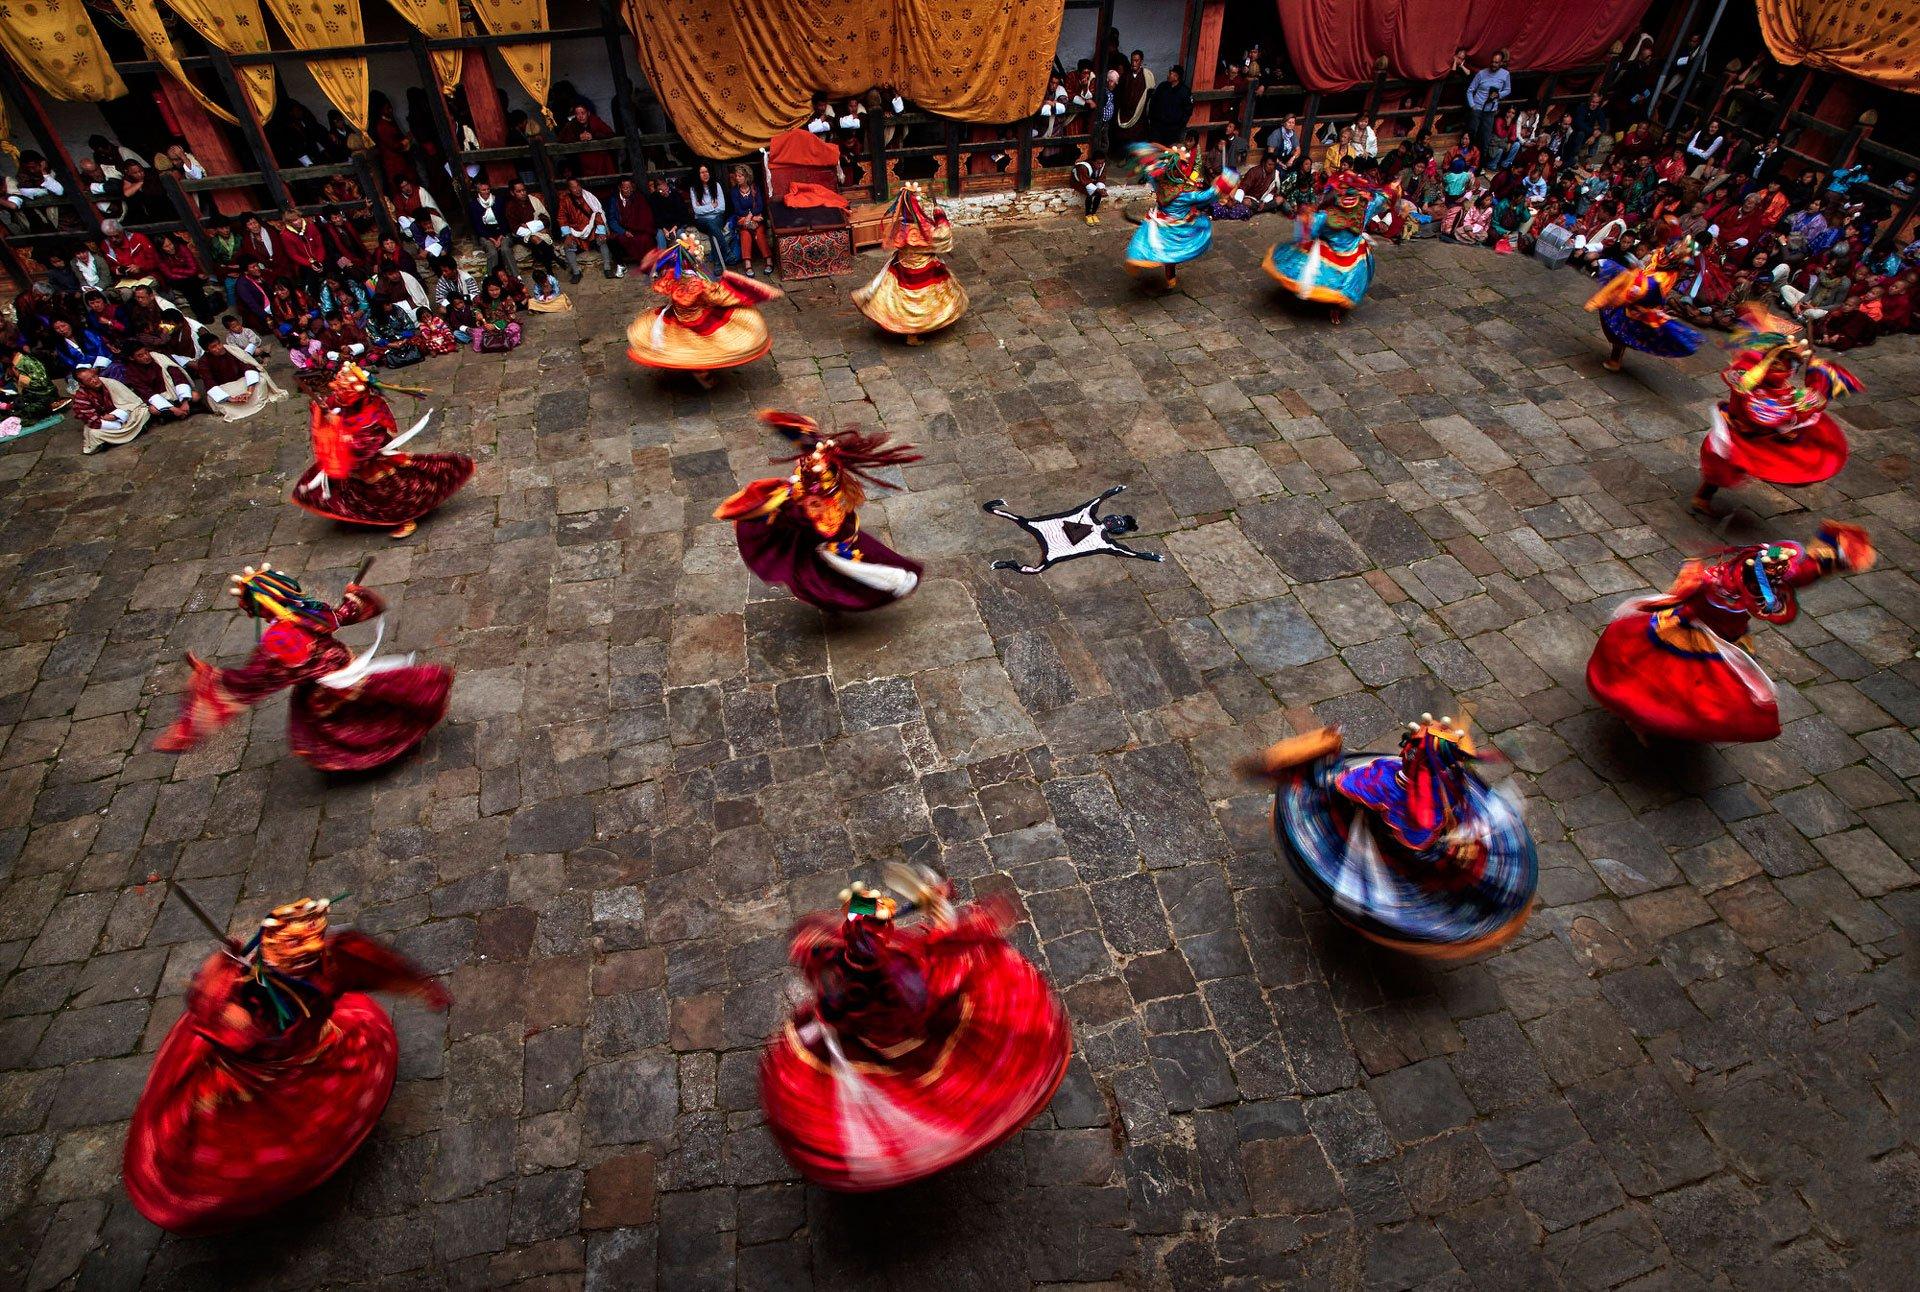 Tshechu Festival - Bhutan an annual religious Bhutanese festivals held in each district or dzongkhag of Bhutan on the tenth day of a month of the lunar Tibetan calendar.